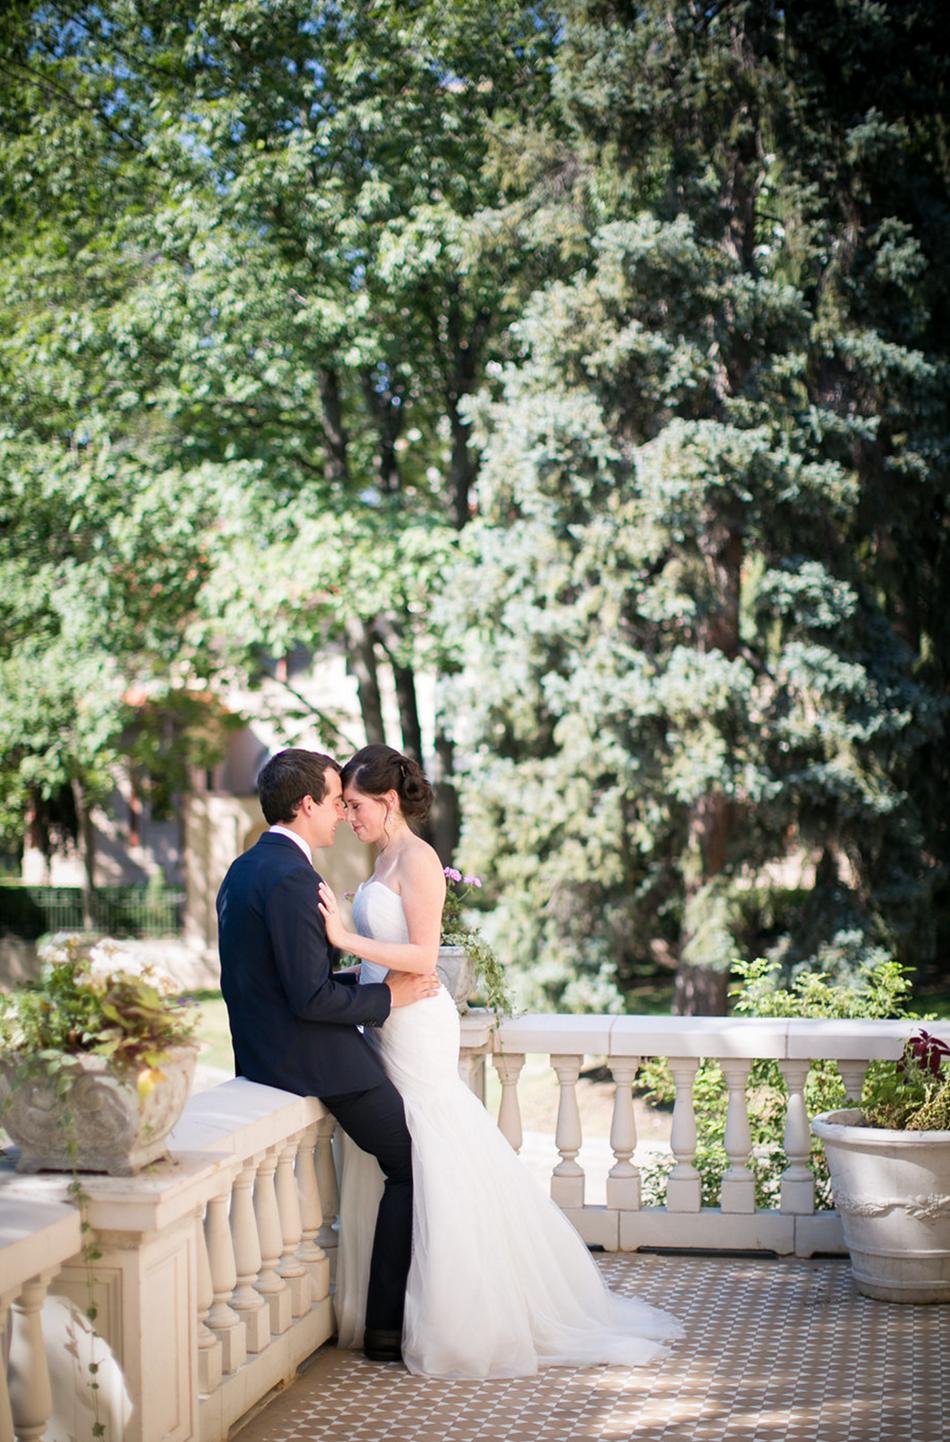 monique_lhuillier_denver_wedding11.jpg